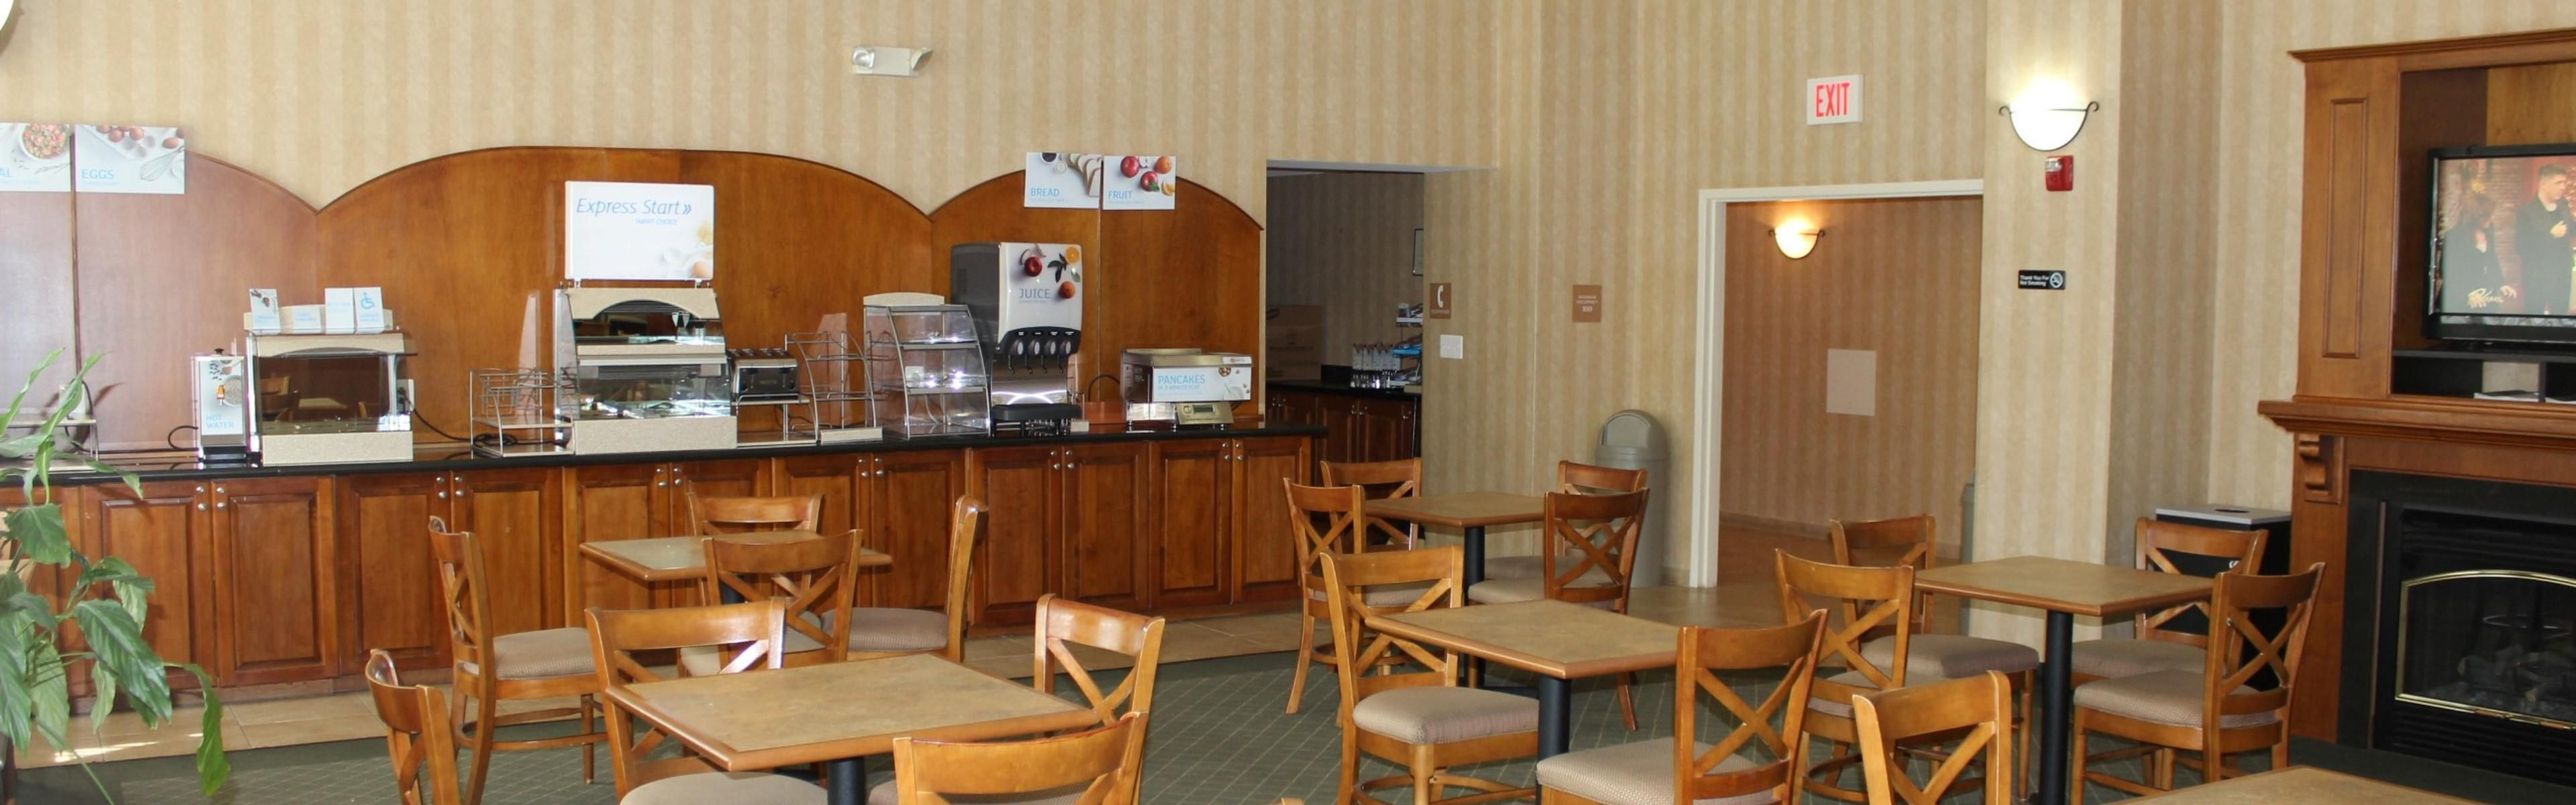 Holiday Inn Express & Suites Warrenton image 2